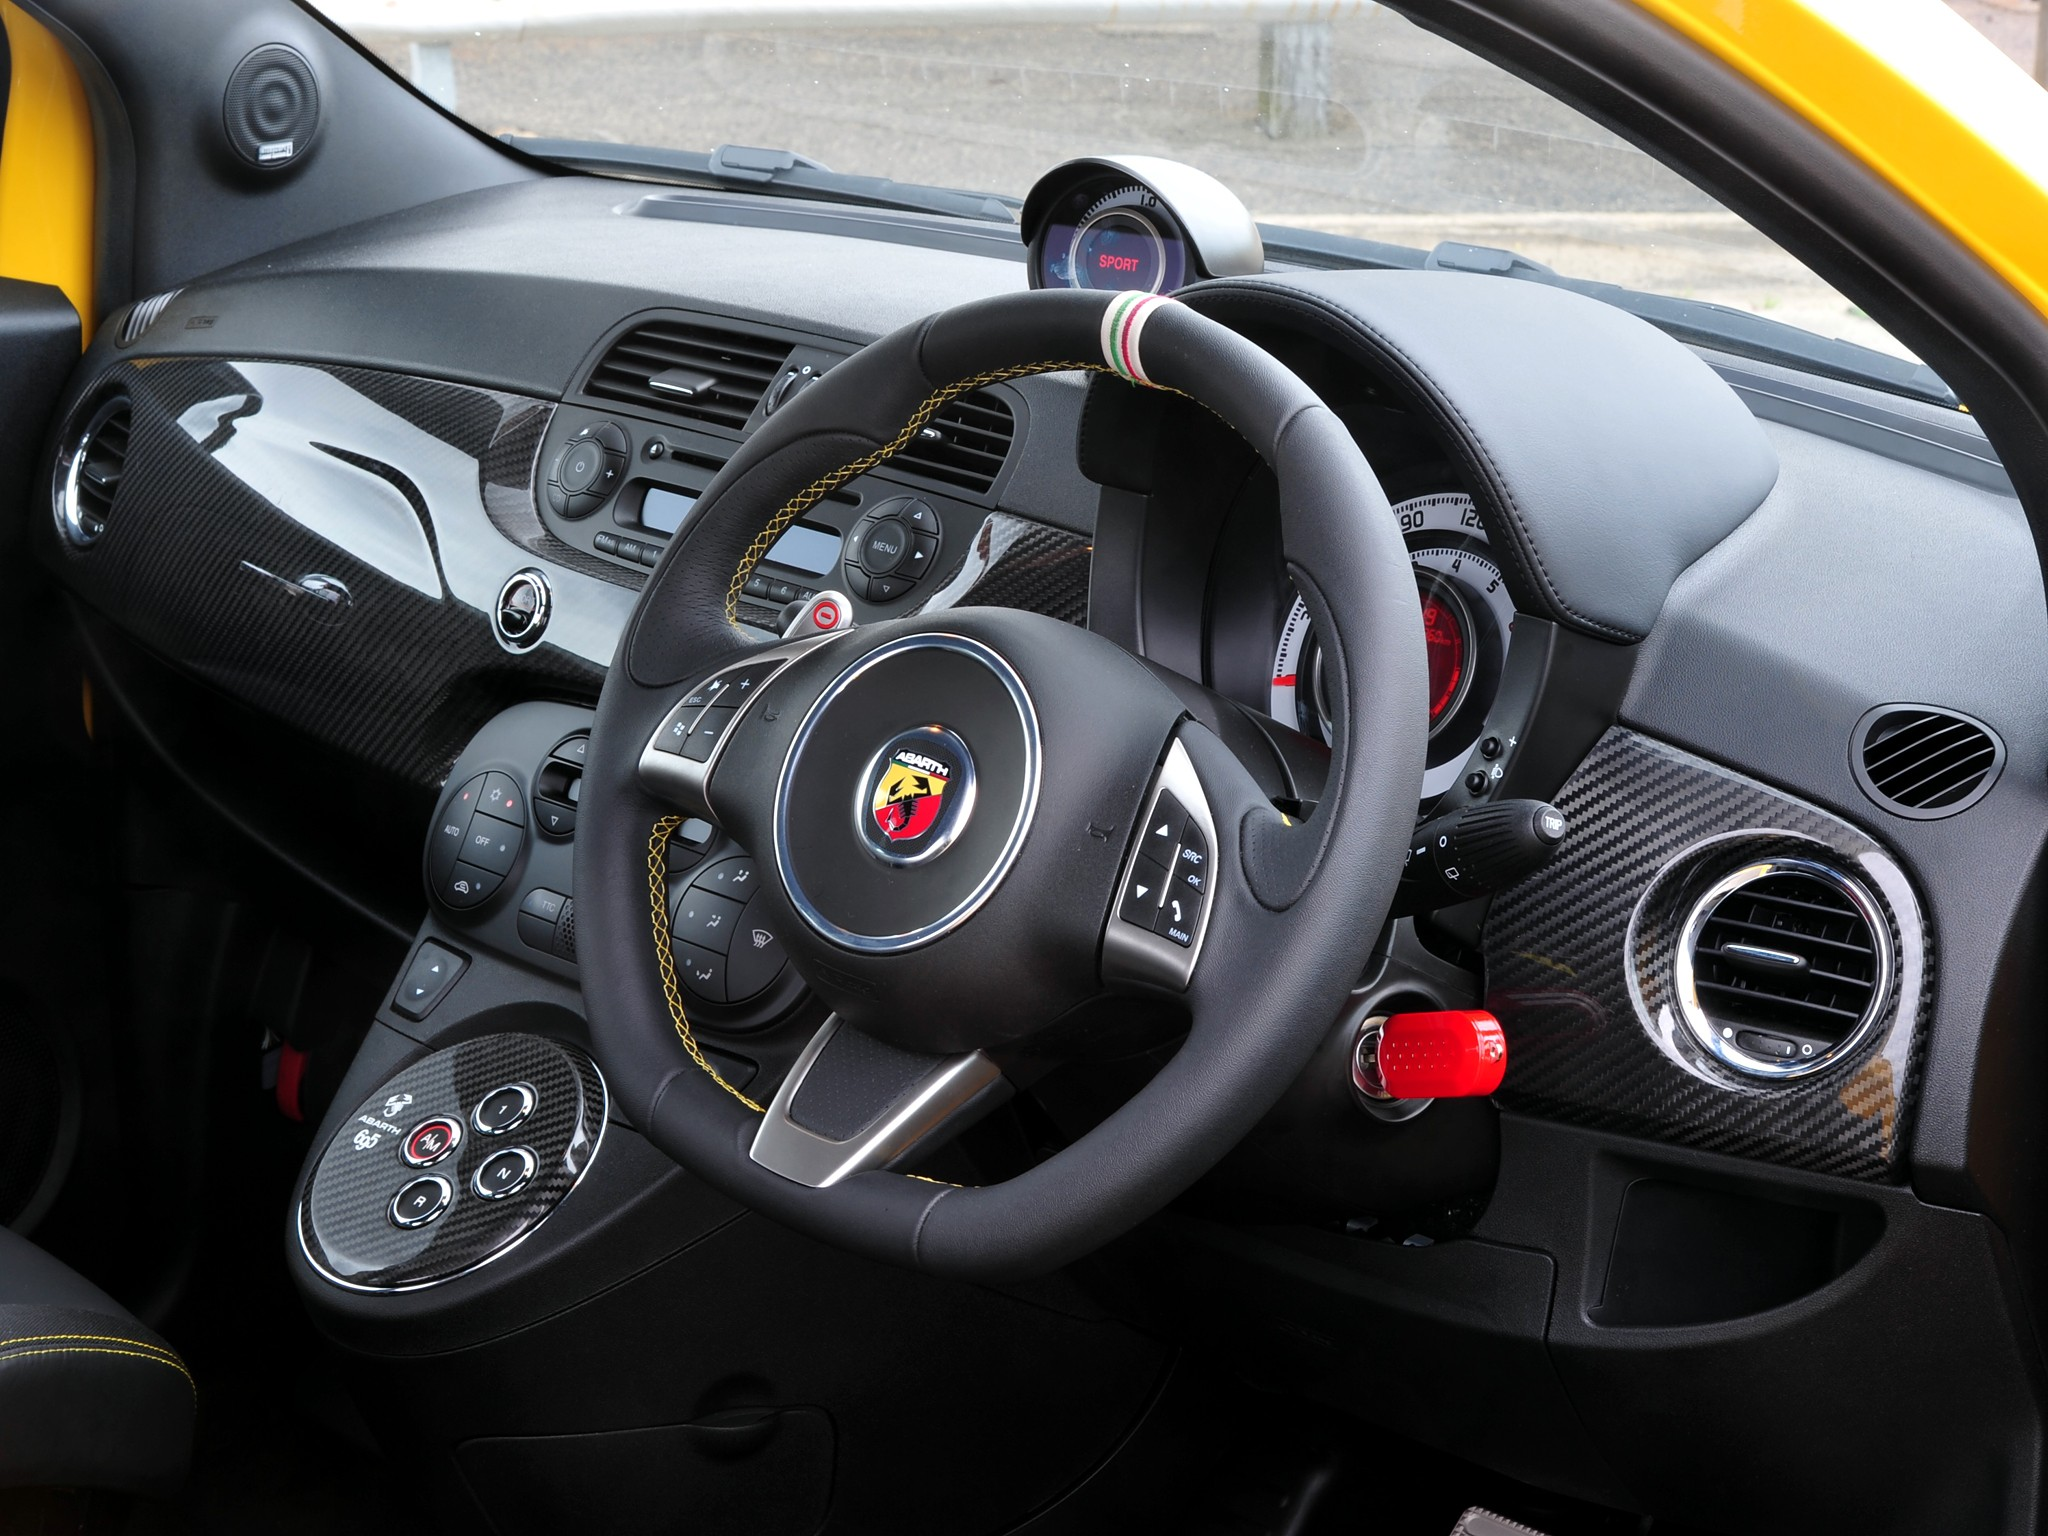 Fiat 500 Abarth 695 Tributo Ferrari Specs Photos 2009 2010 2011 2012 2013 2014 2015 2016 2017 2018 2019 2020 2021 Autoevolution